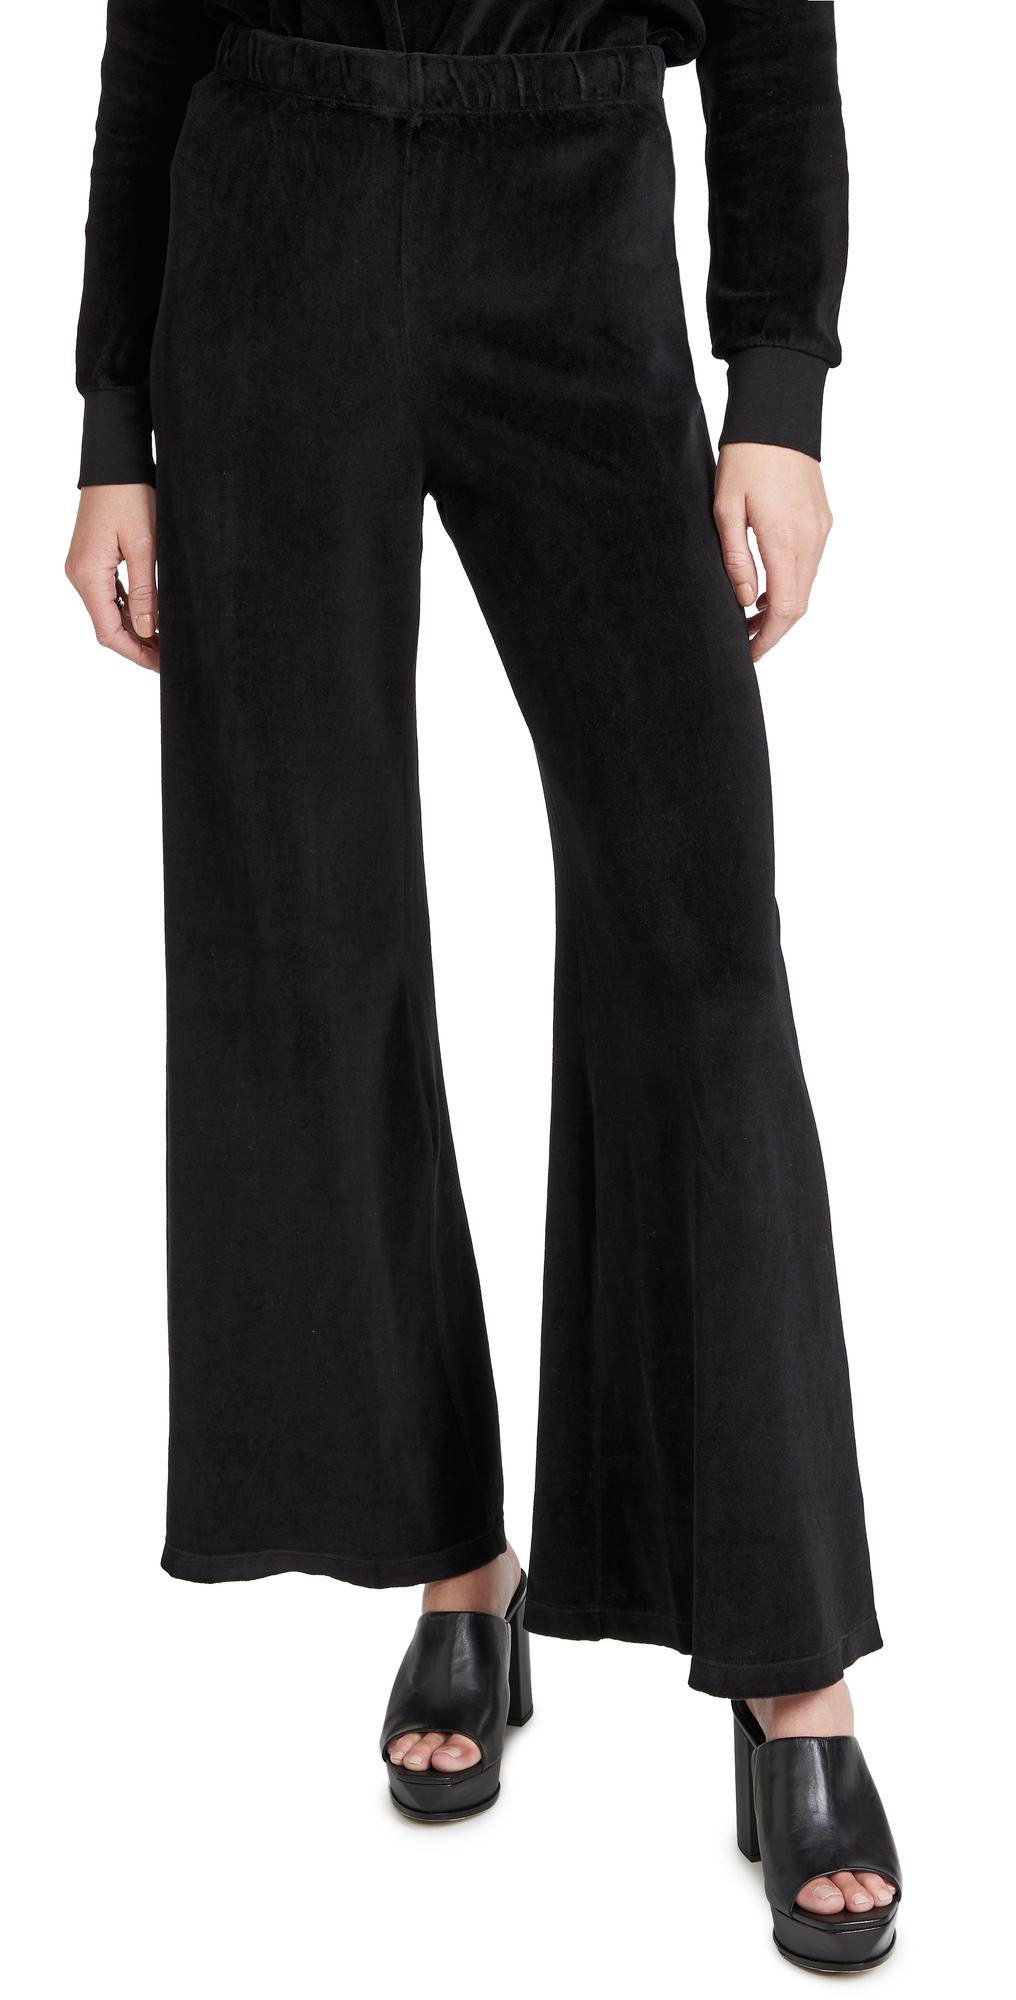 Velour Flare Pants